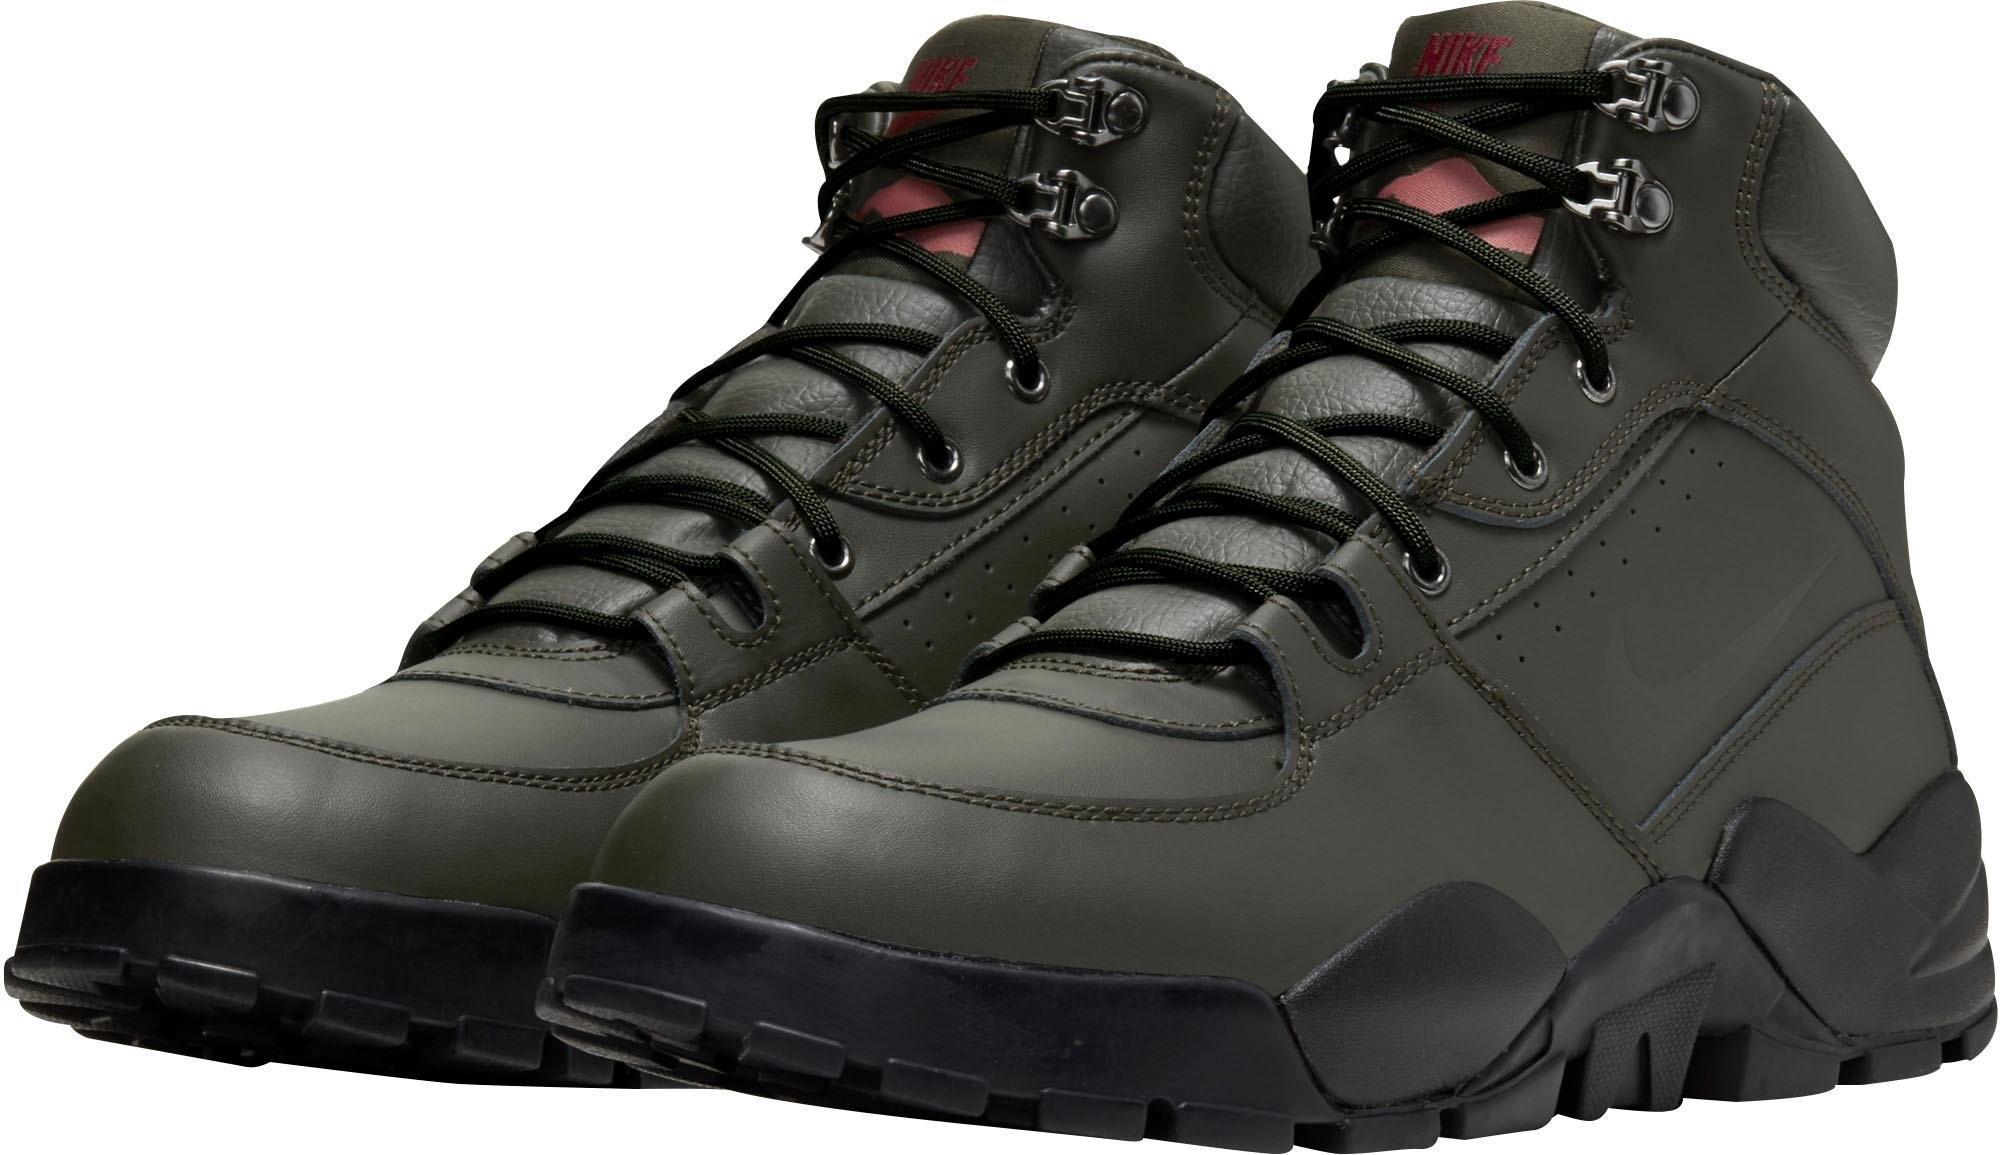 Nike Sportswear hoge veterschoenen RHYODOMO voordelig en veilig online kopen